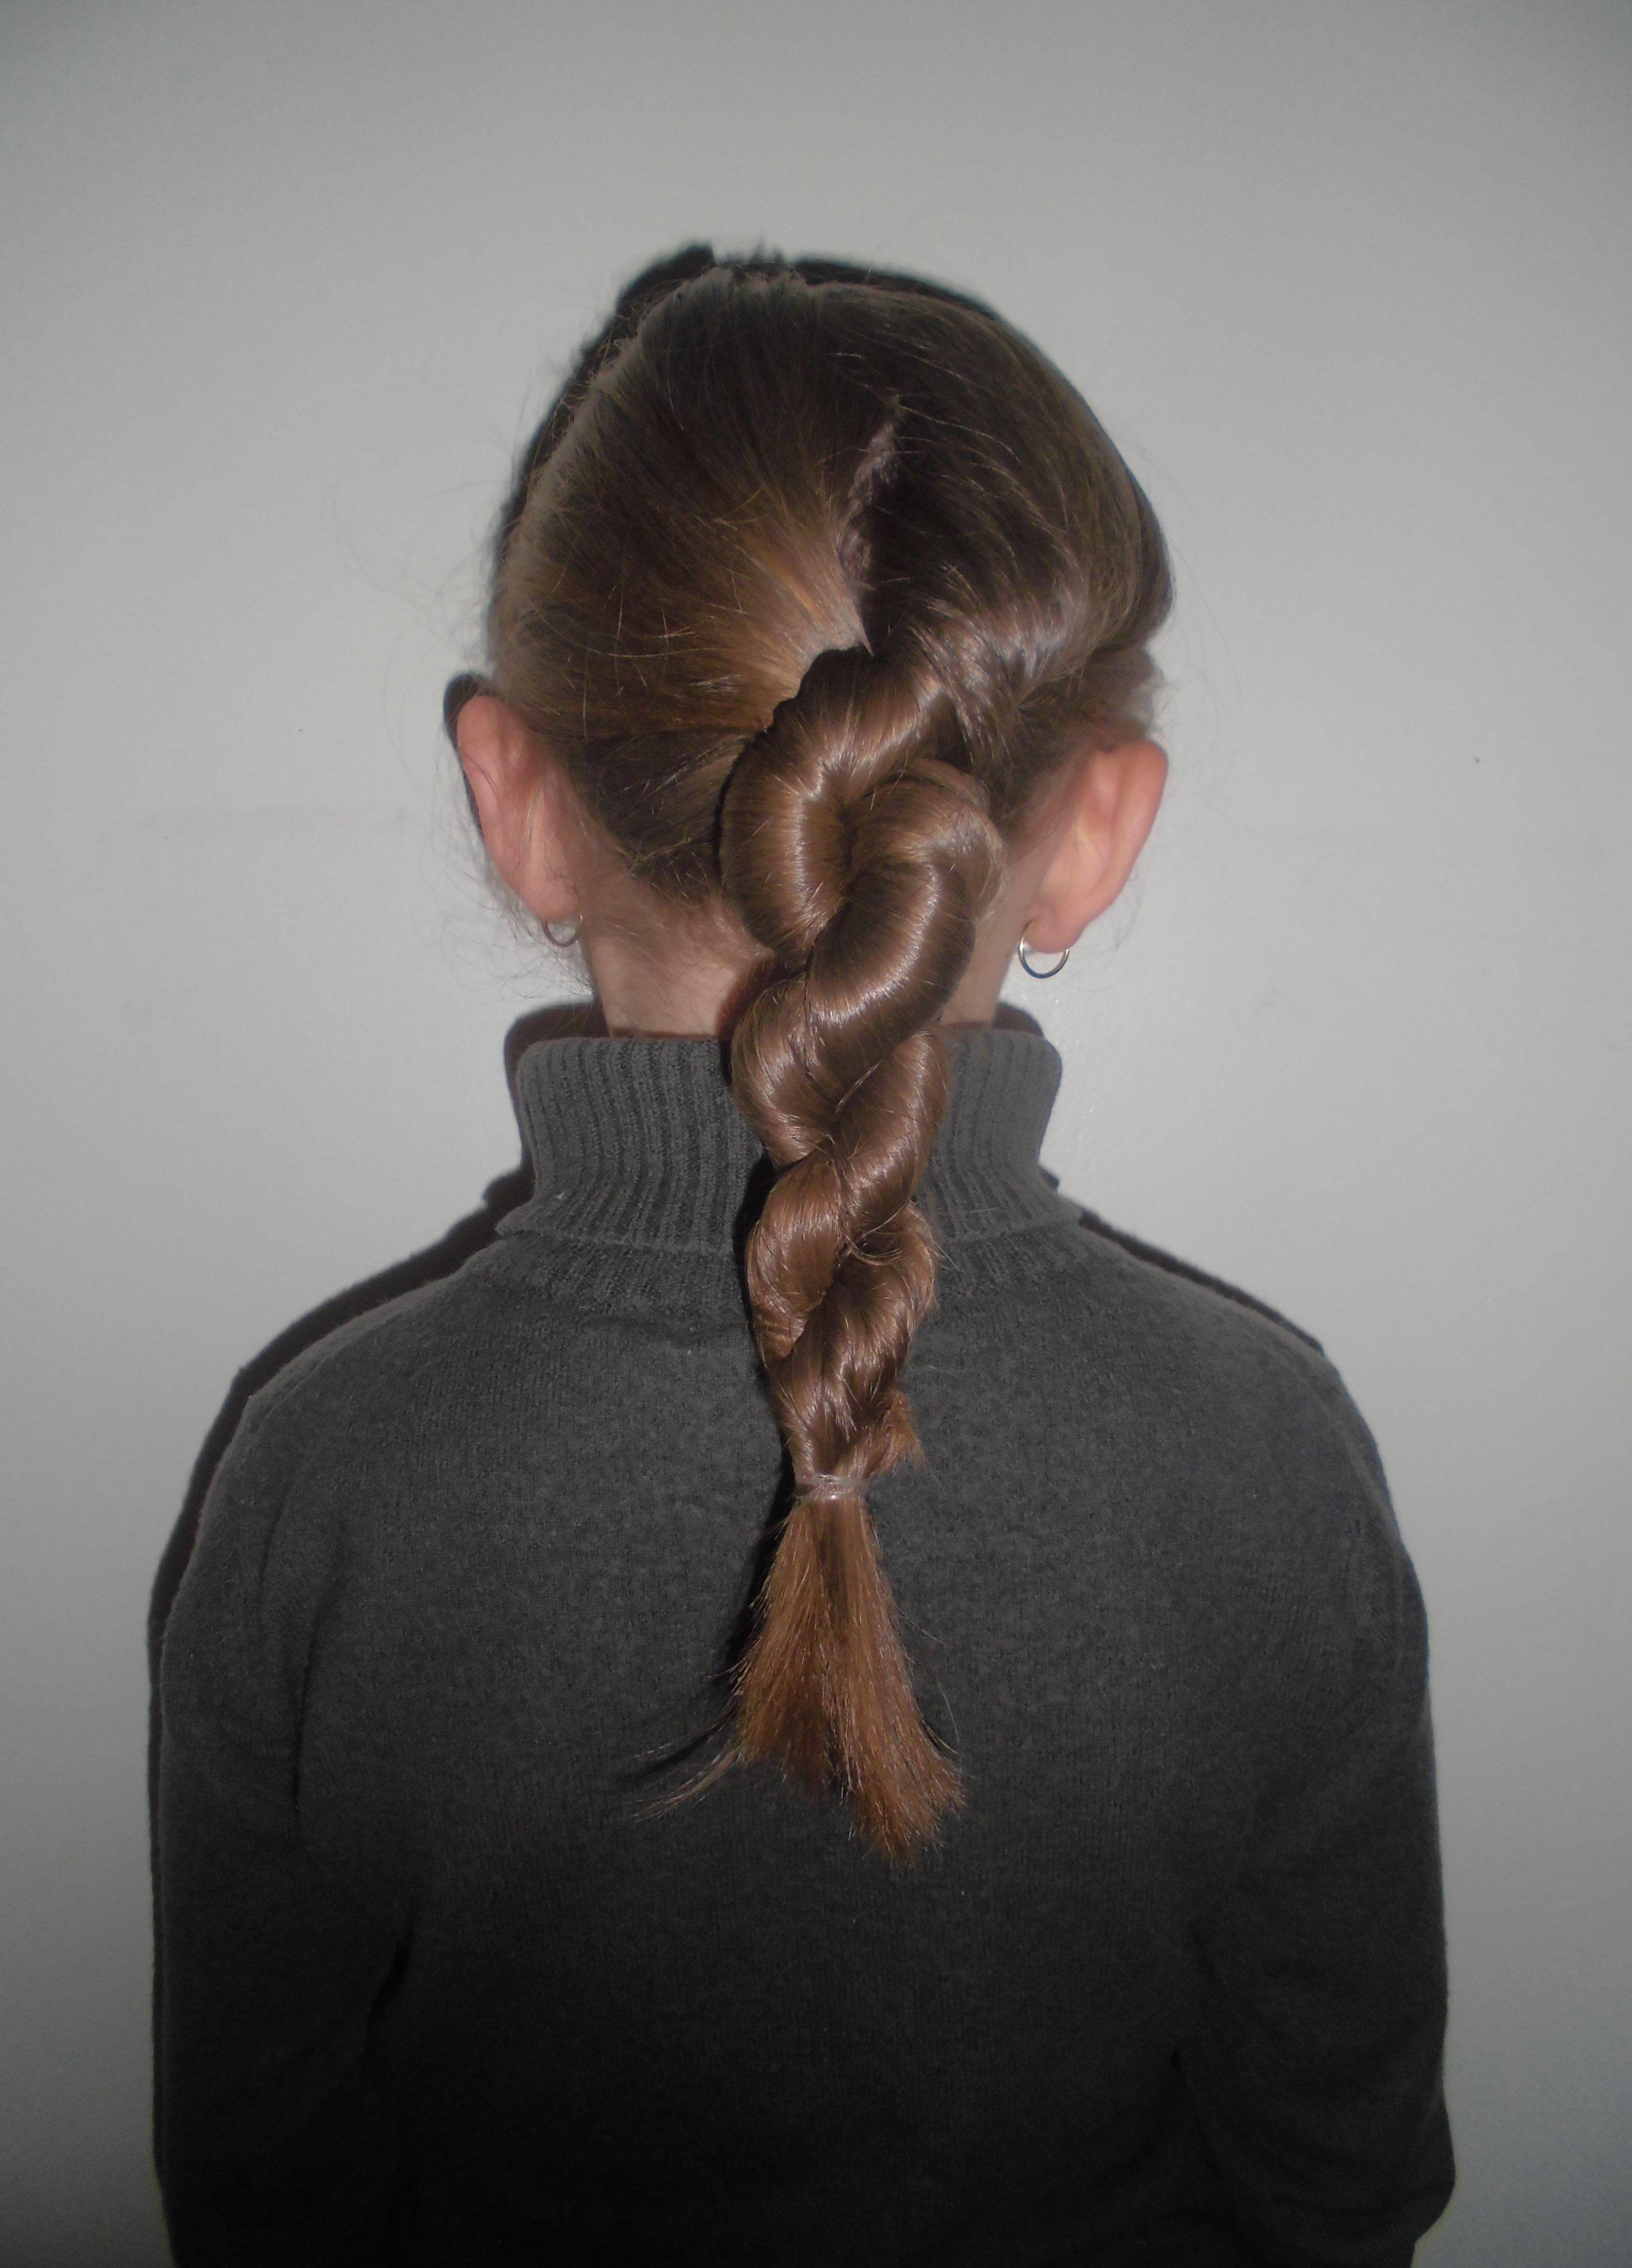 The Twisting Braid